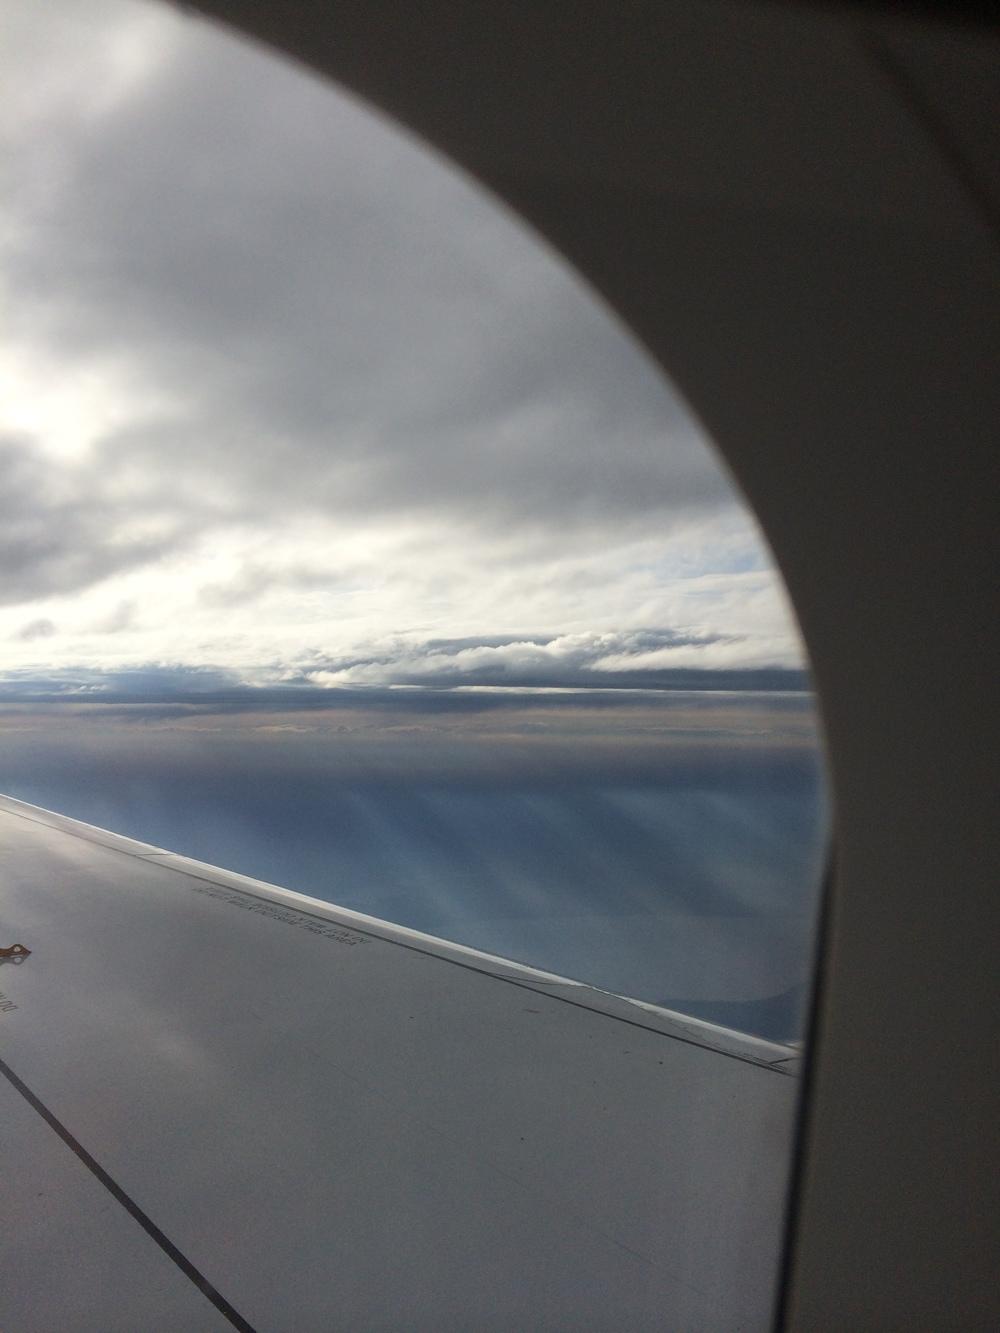 On plane over East Coast somewhere